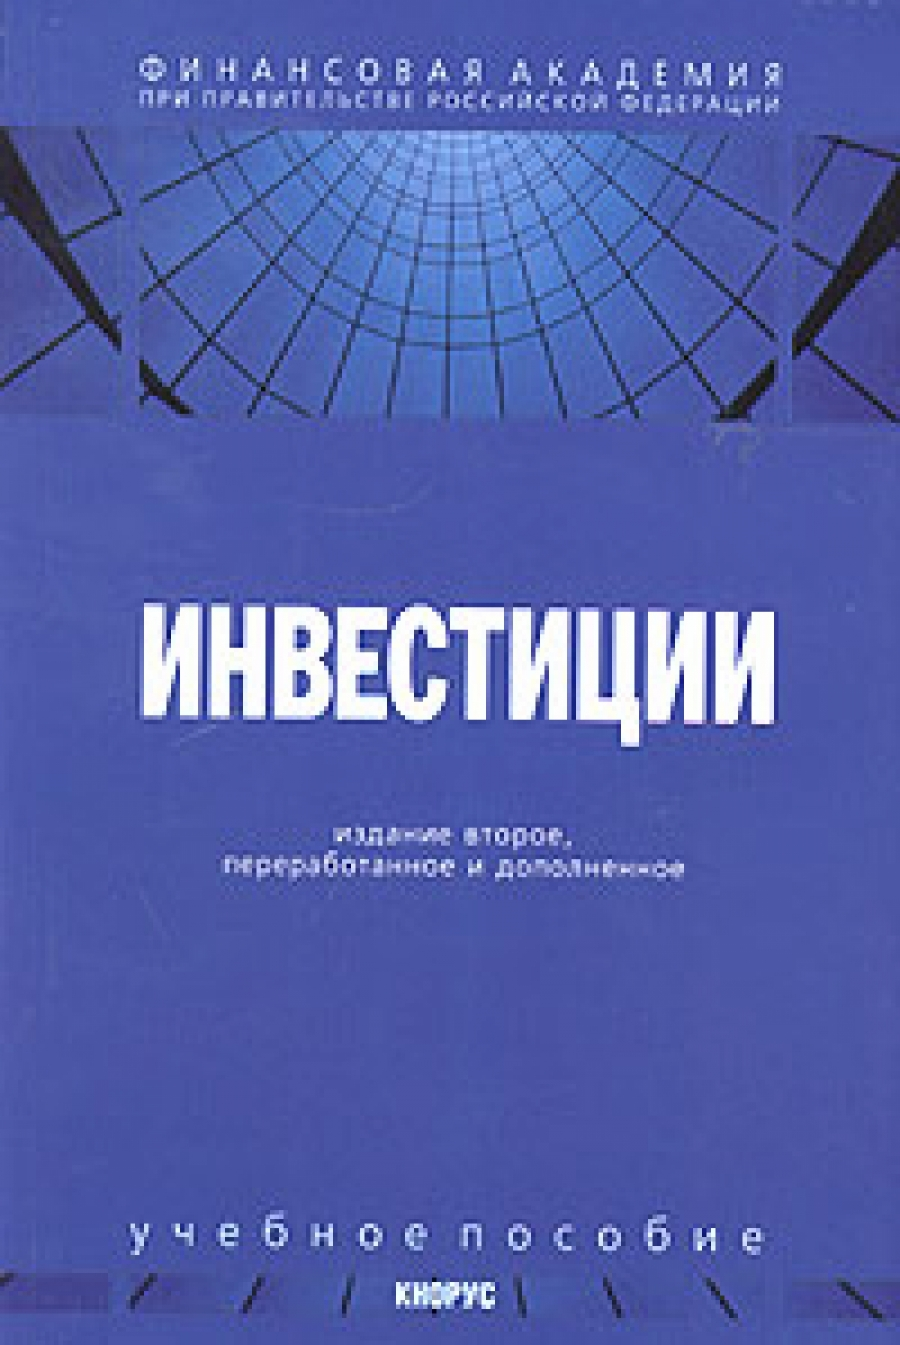 Обложка книги:  подшиваленко г. п., лахметкина н.и., макарова м.в. и др. - инвестиции